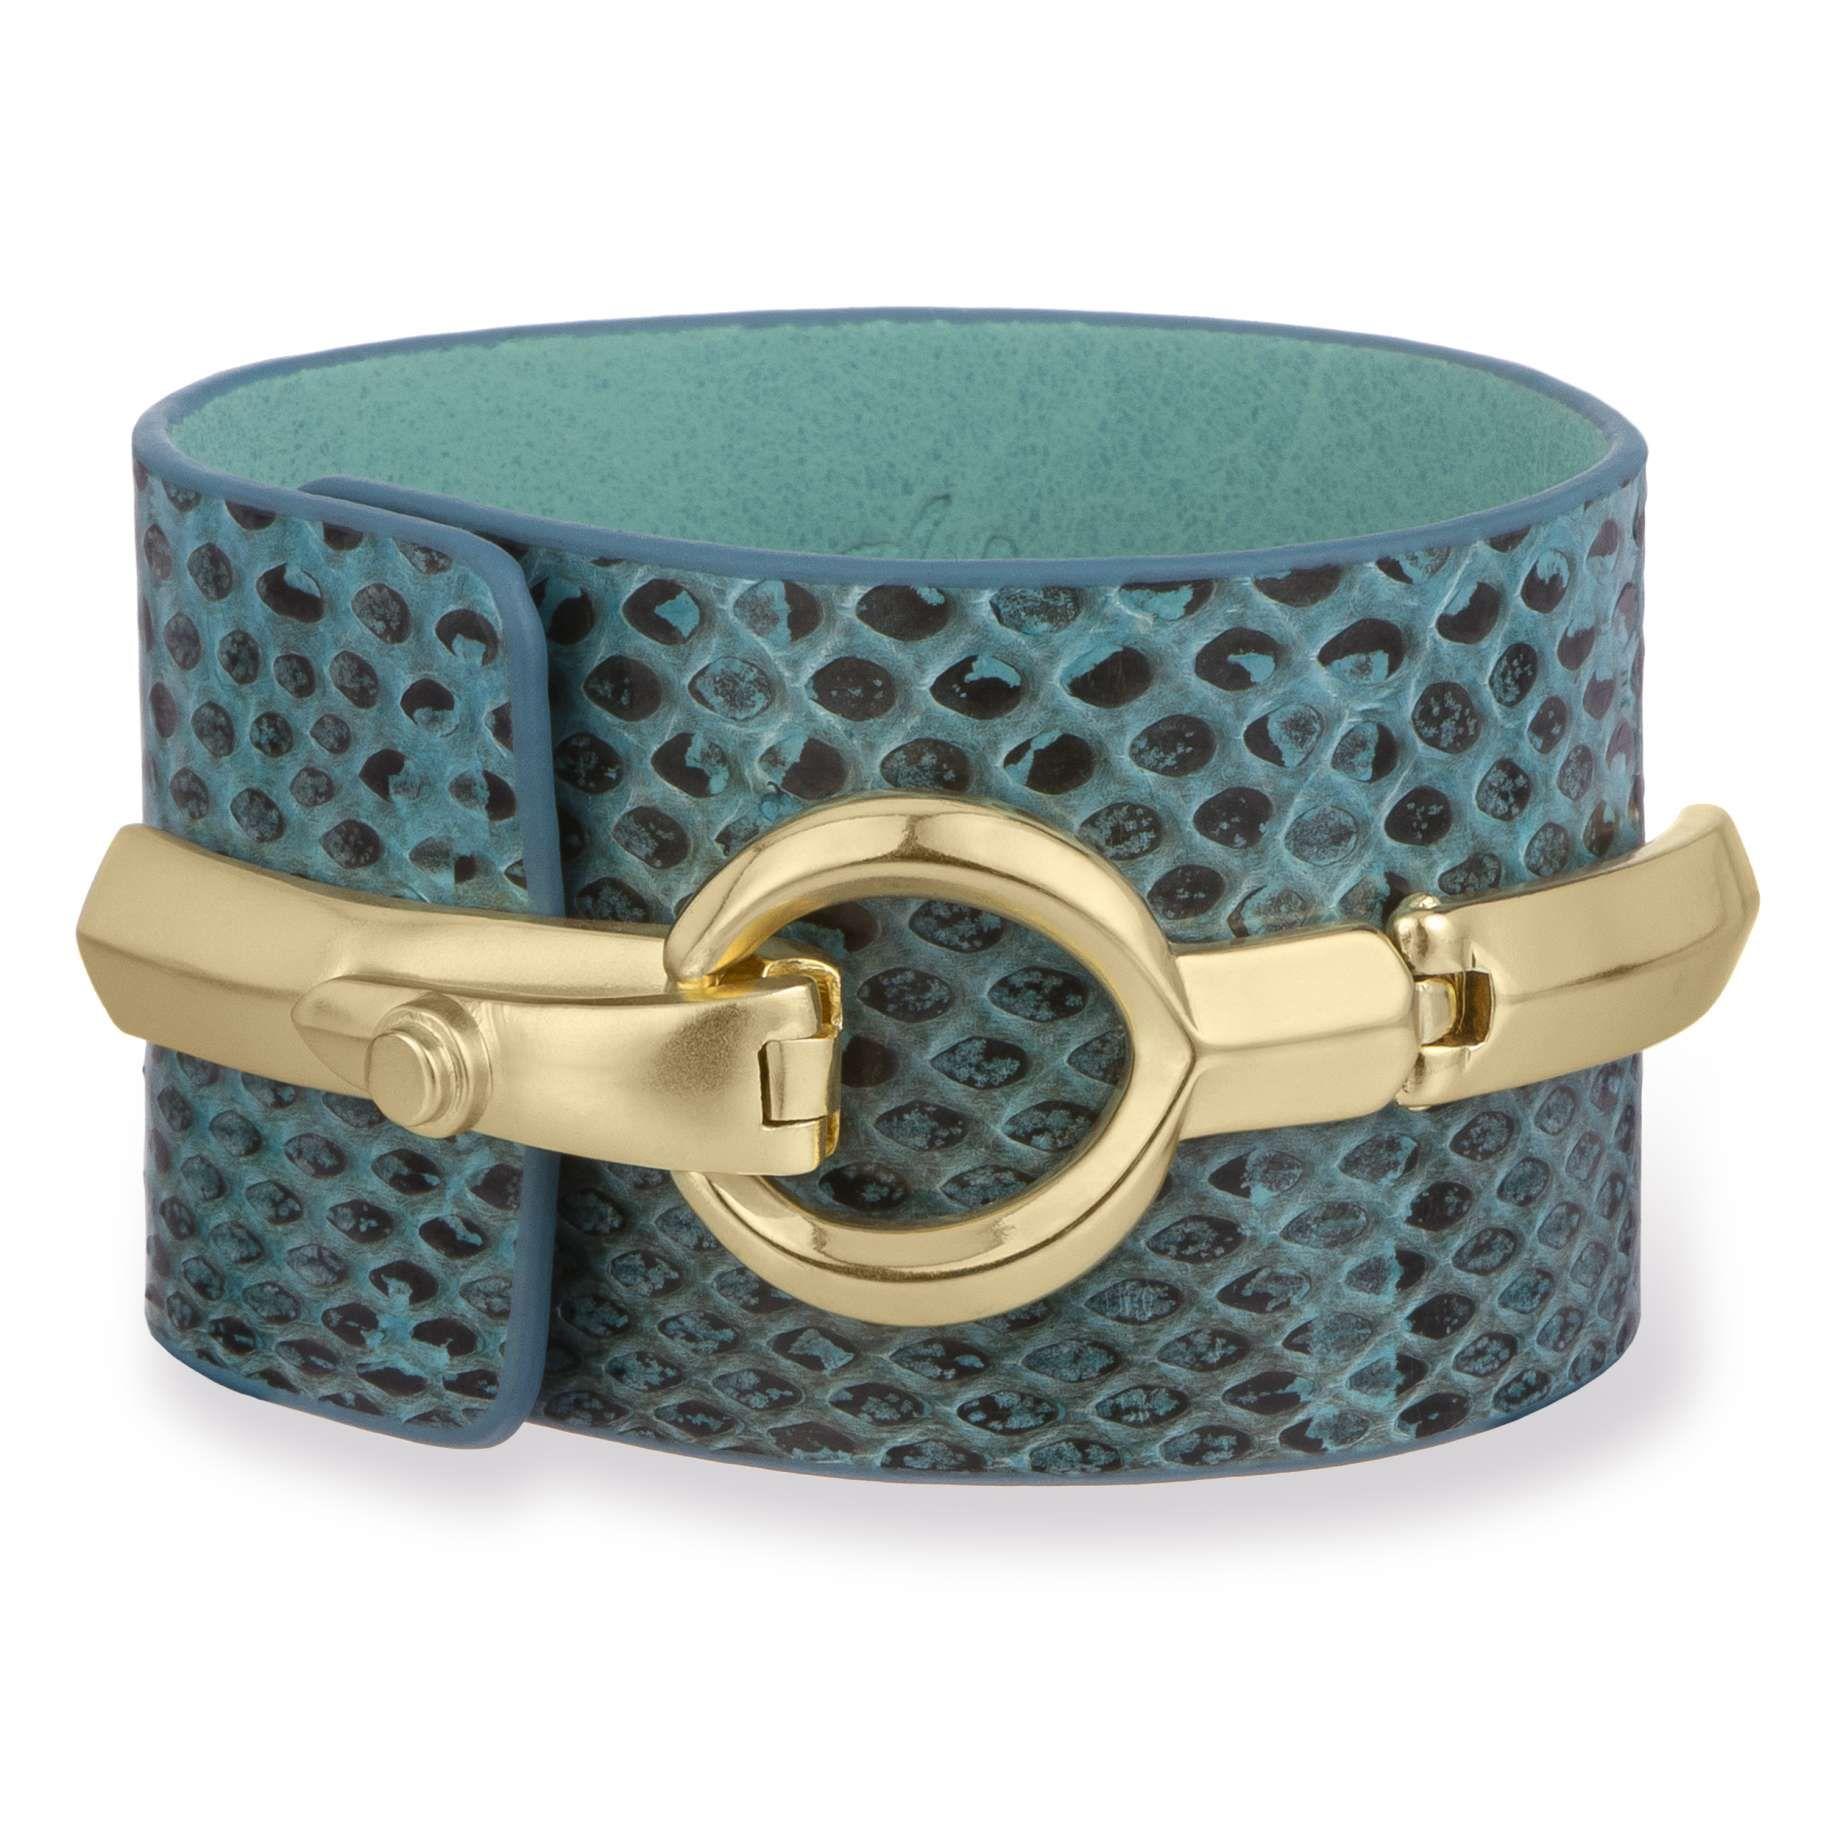 Accessories Sam Edelman Snake Interlock Bracelet Turquoise SamEdelman.com 65